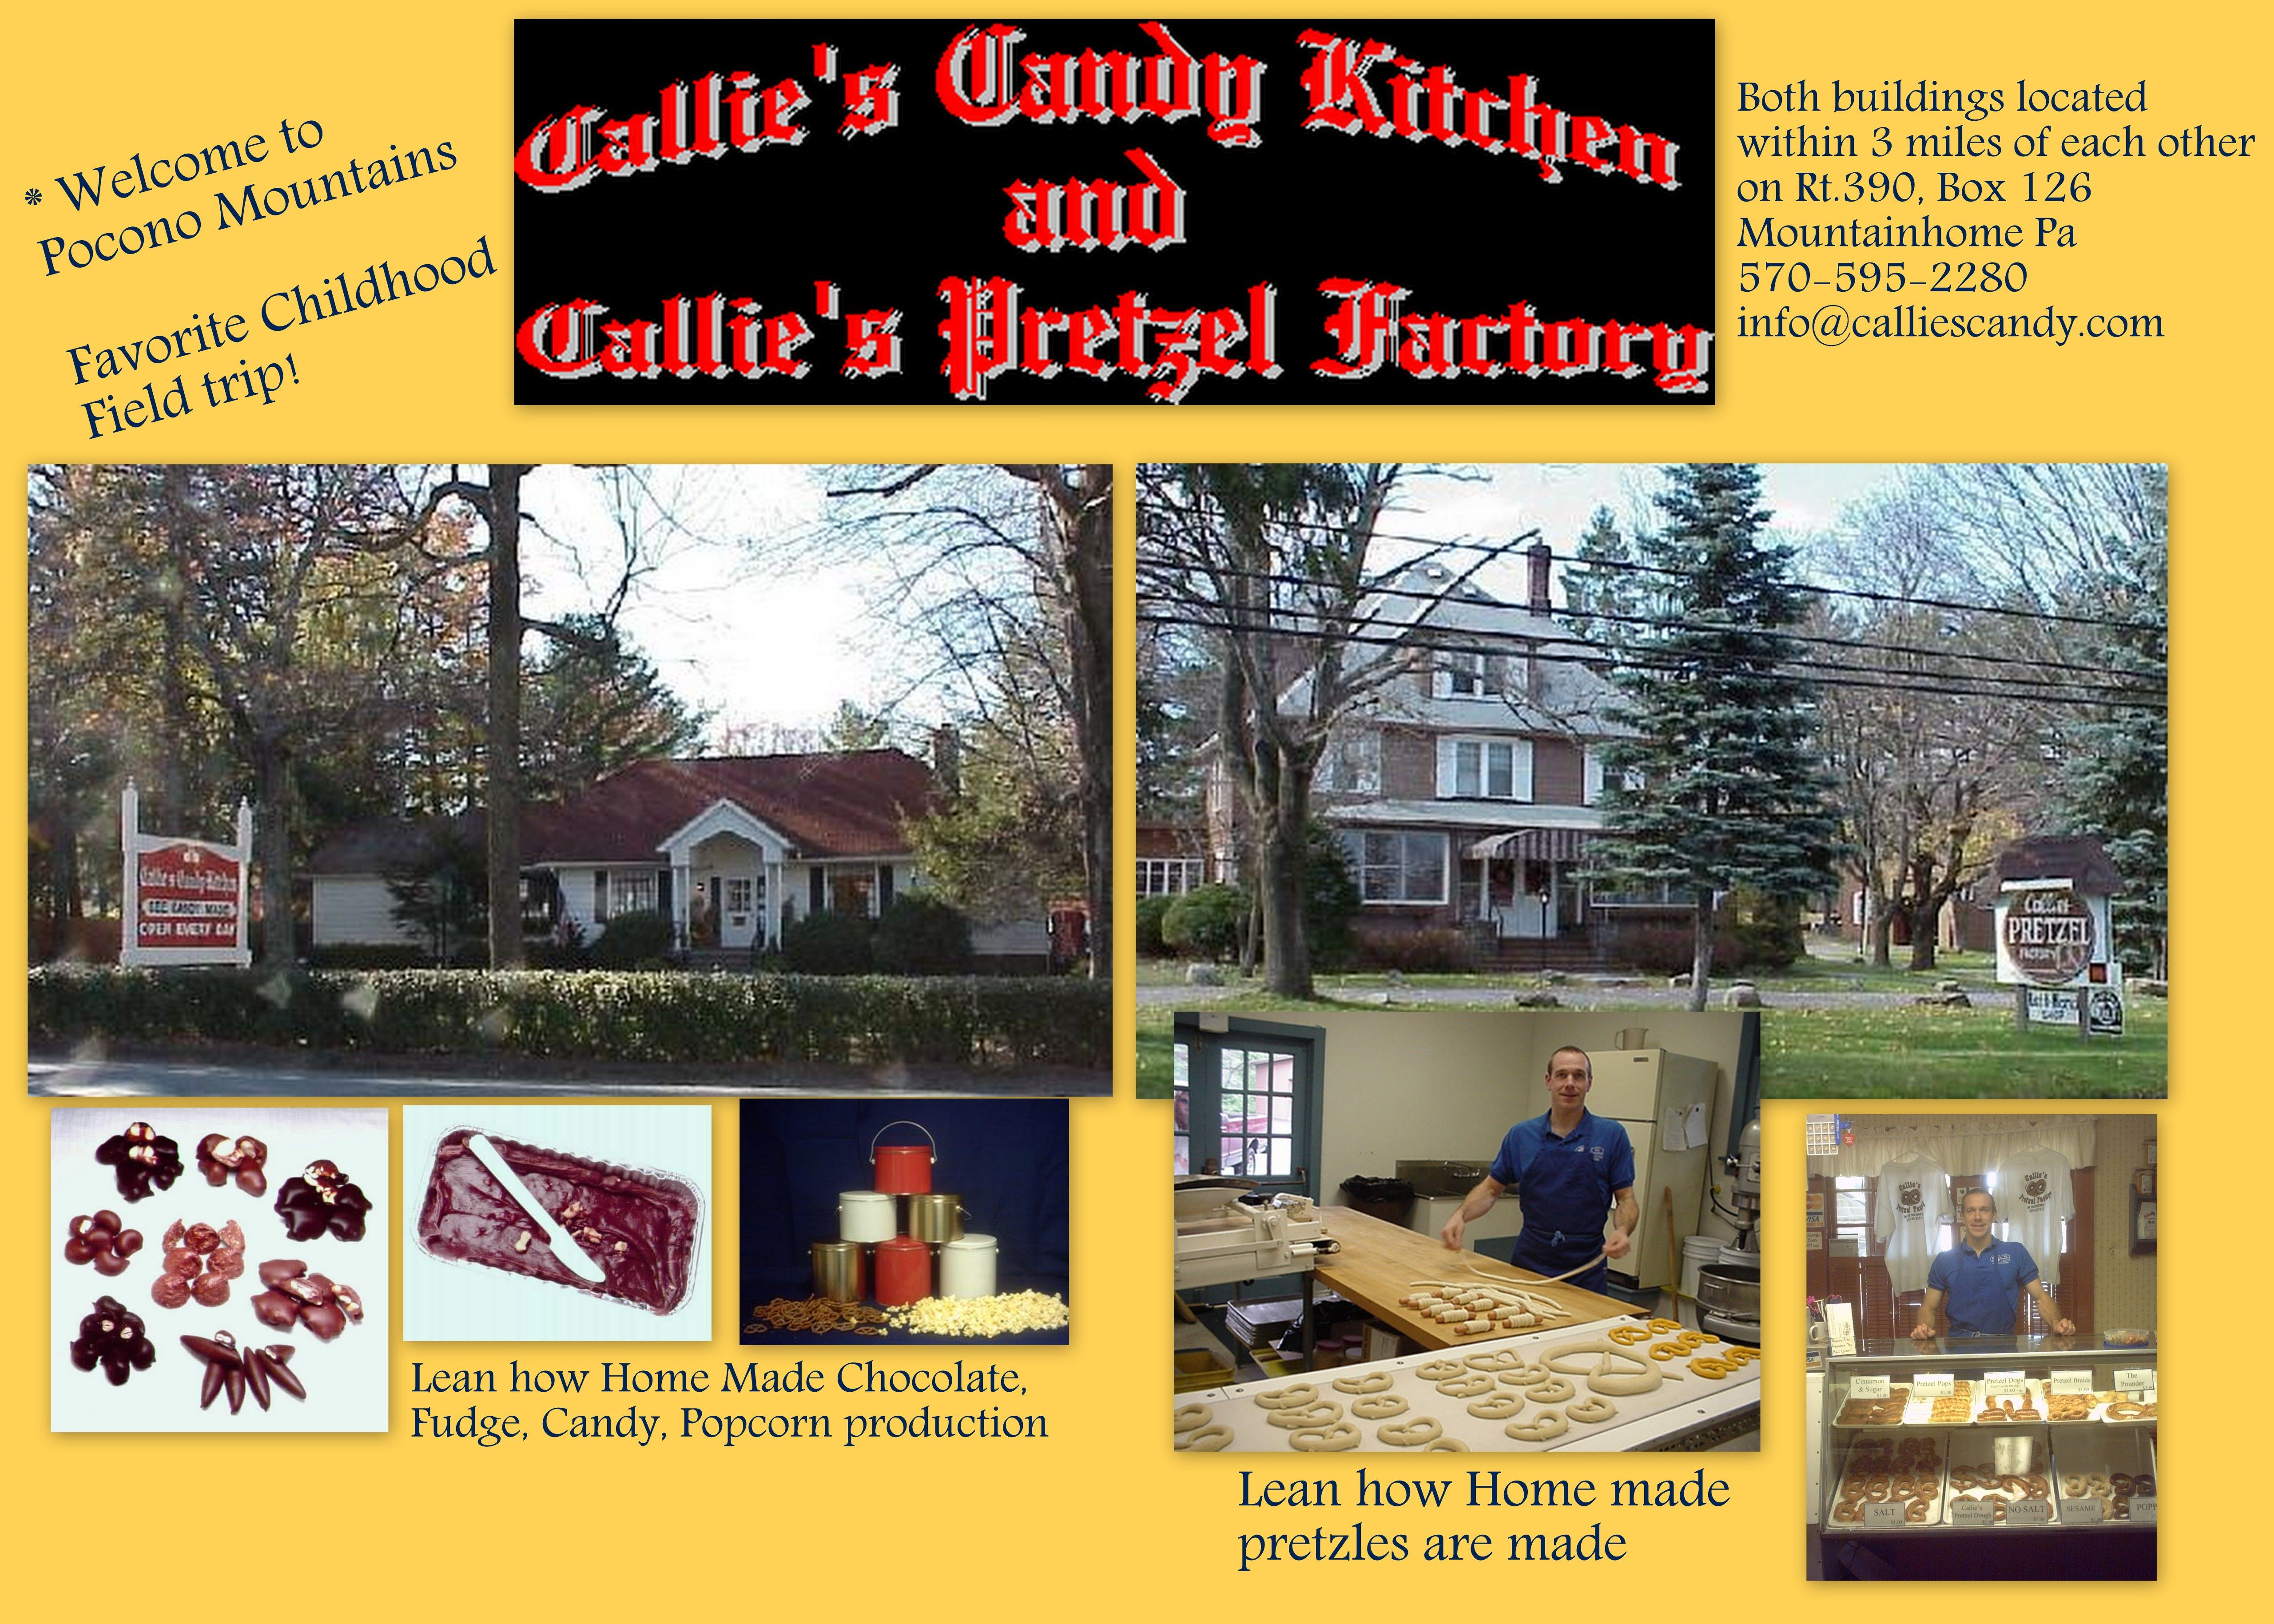 callies candy kitchen callies pretzel factory in the pocono mountains of pennsylvania - Callies Candy Kitchen